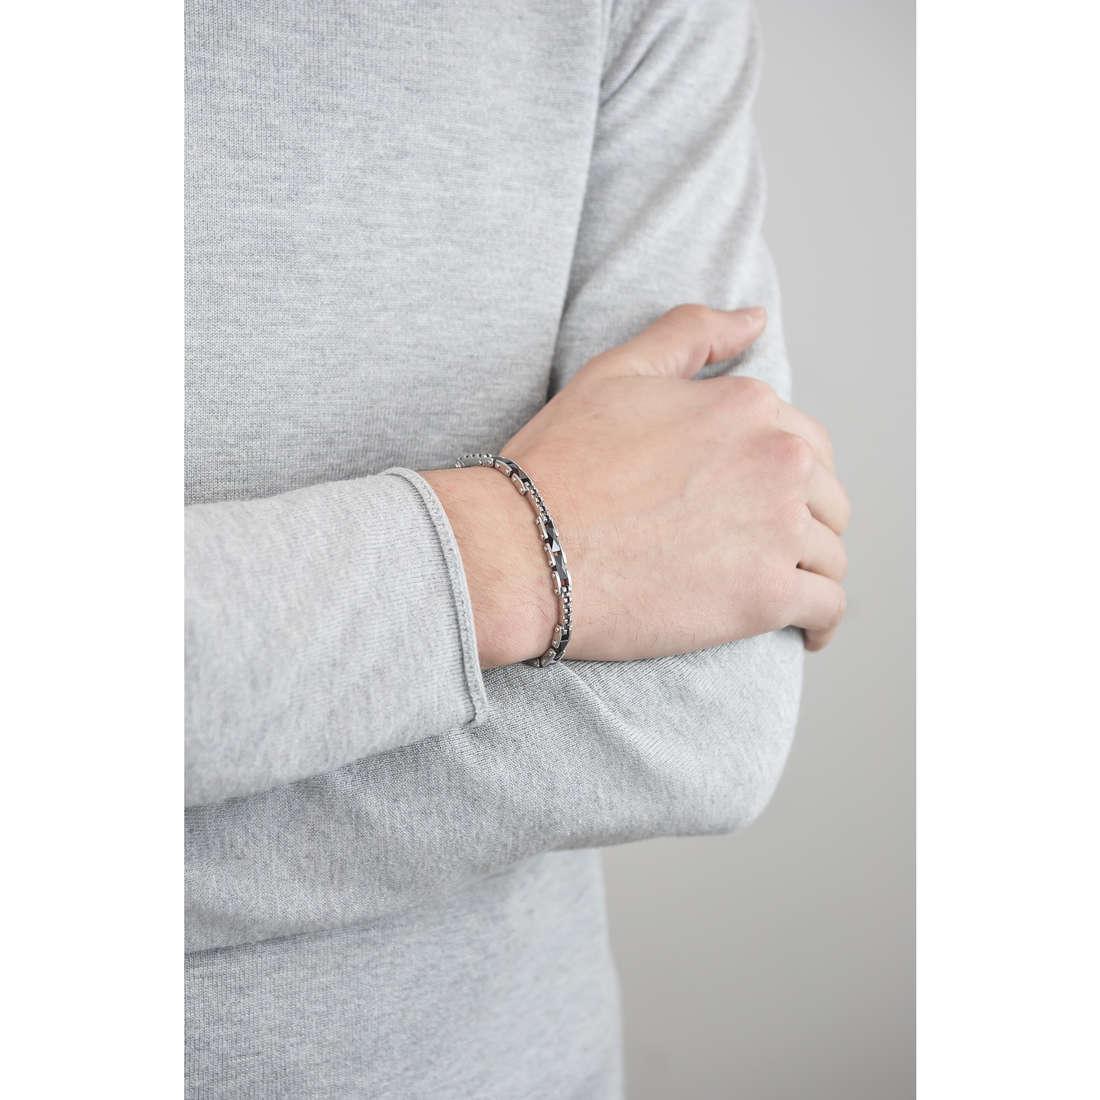 Sector bracciali Ceramic uomo SAFR03 indosso